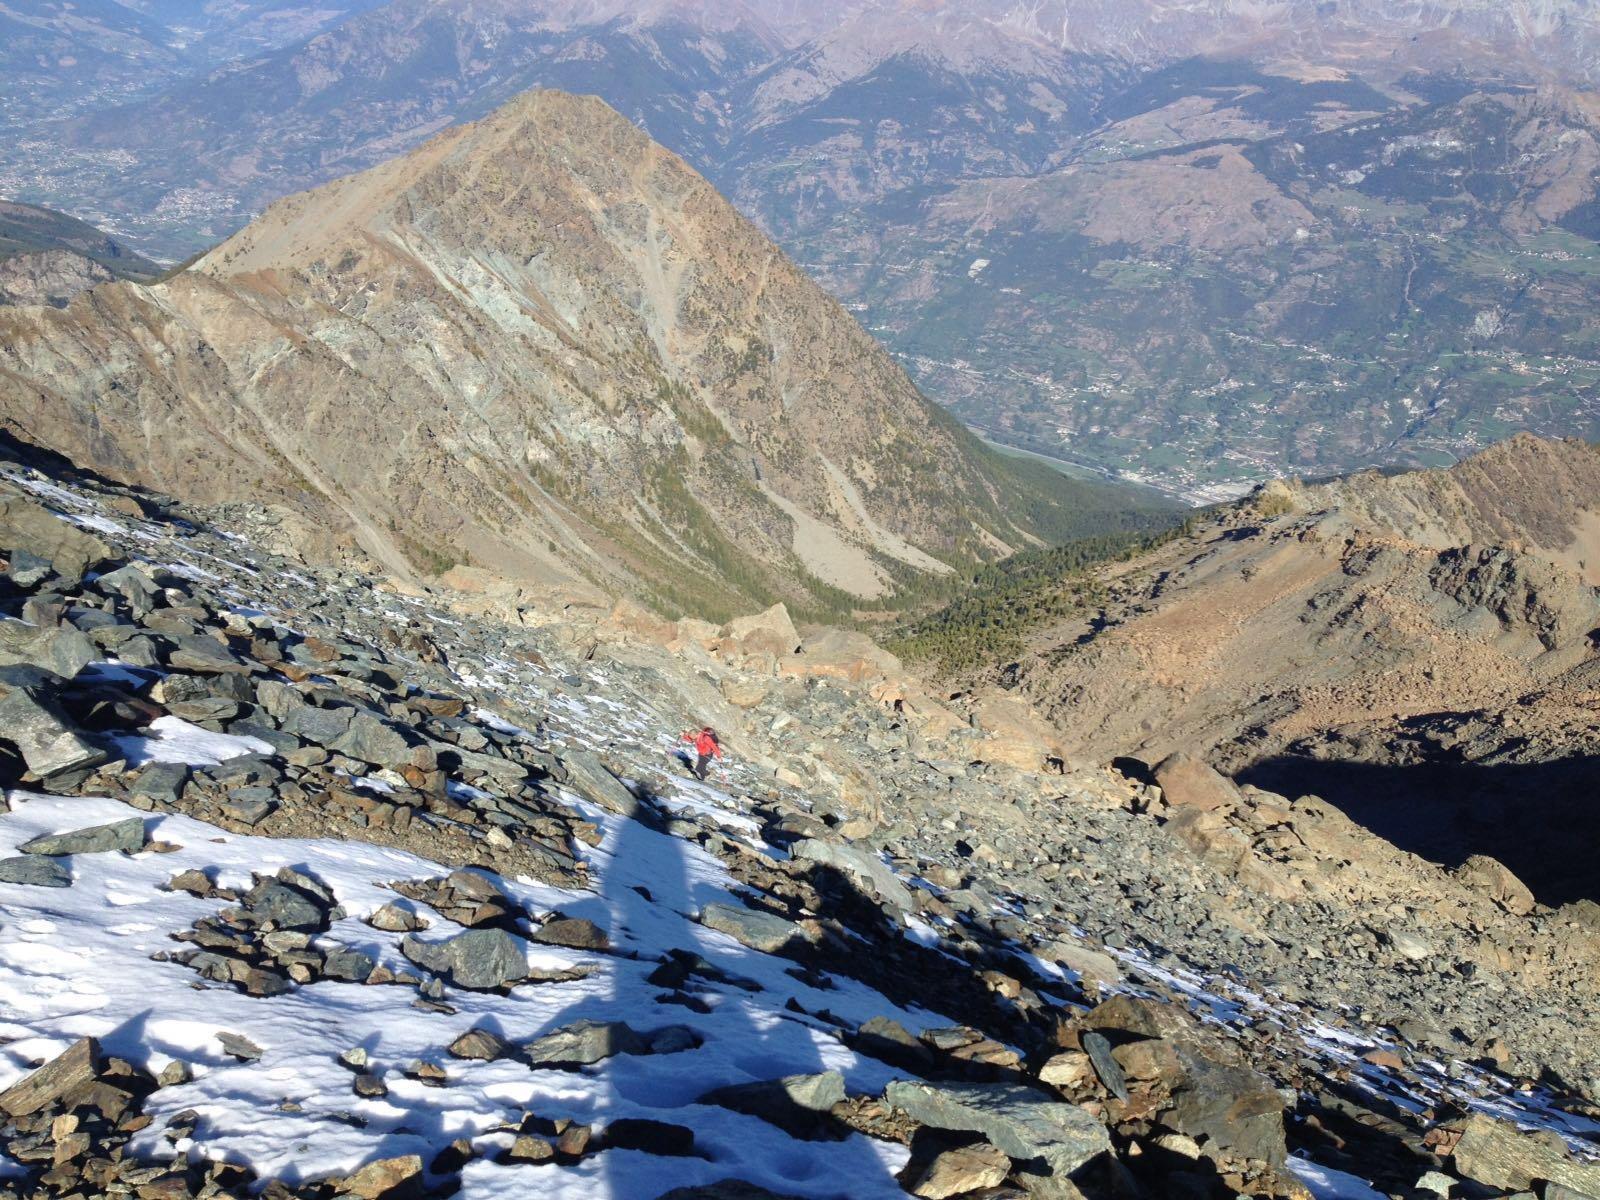 Avic (Monte) traversata Versante NE -Cresta Ovest 2016-10-05